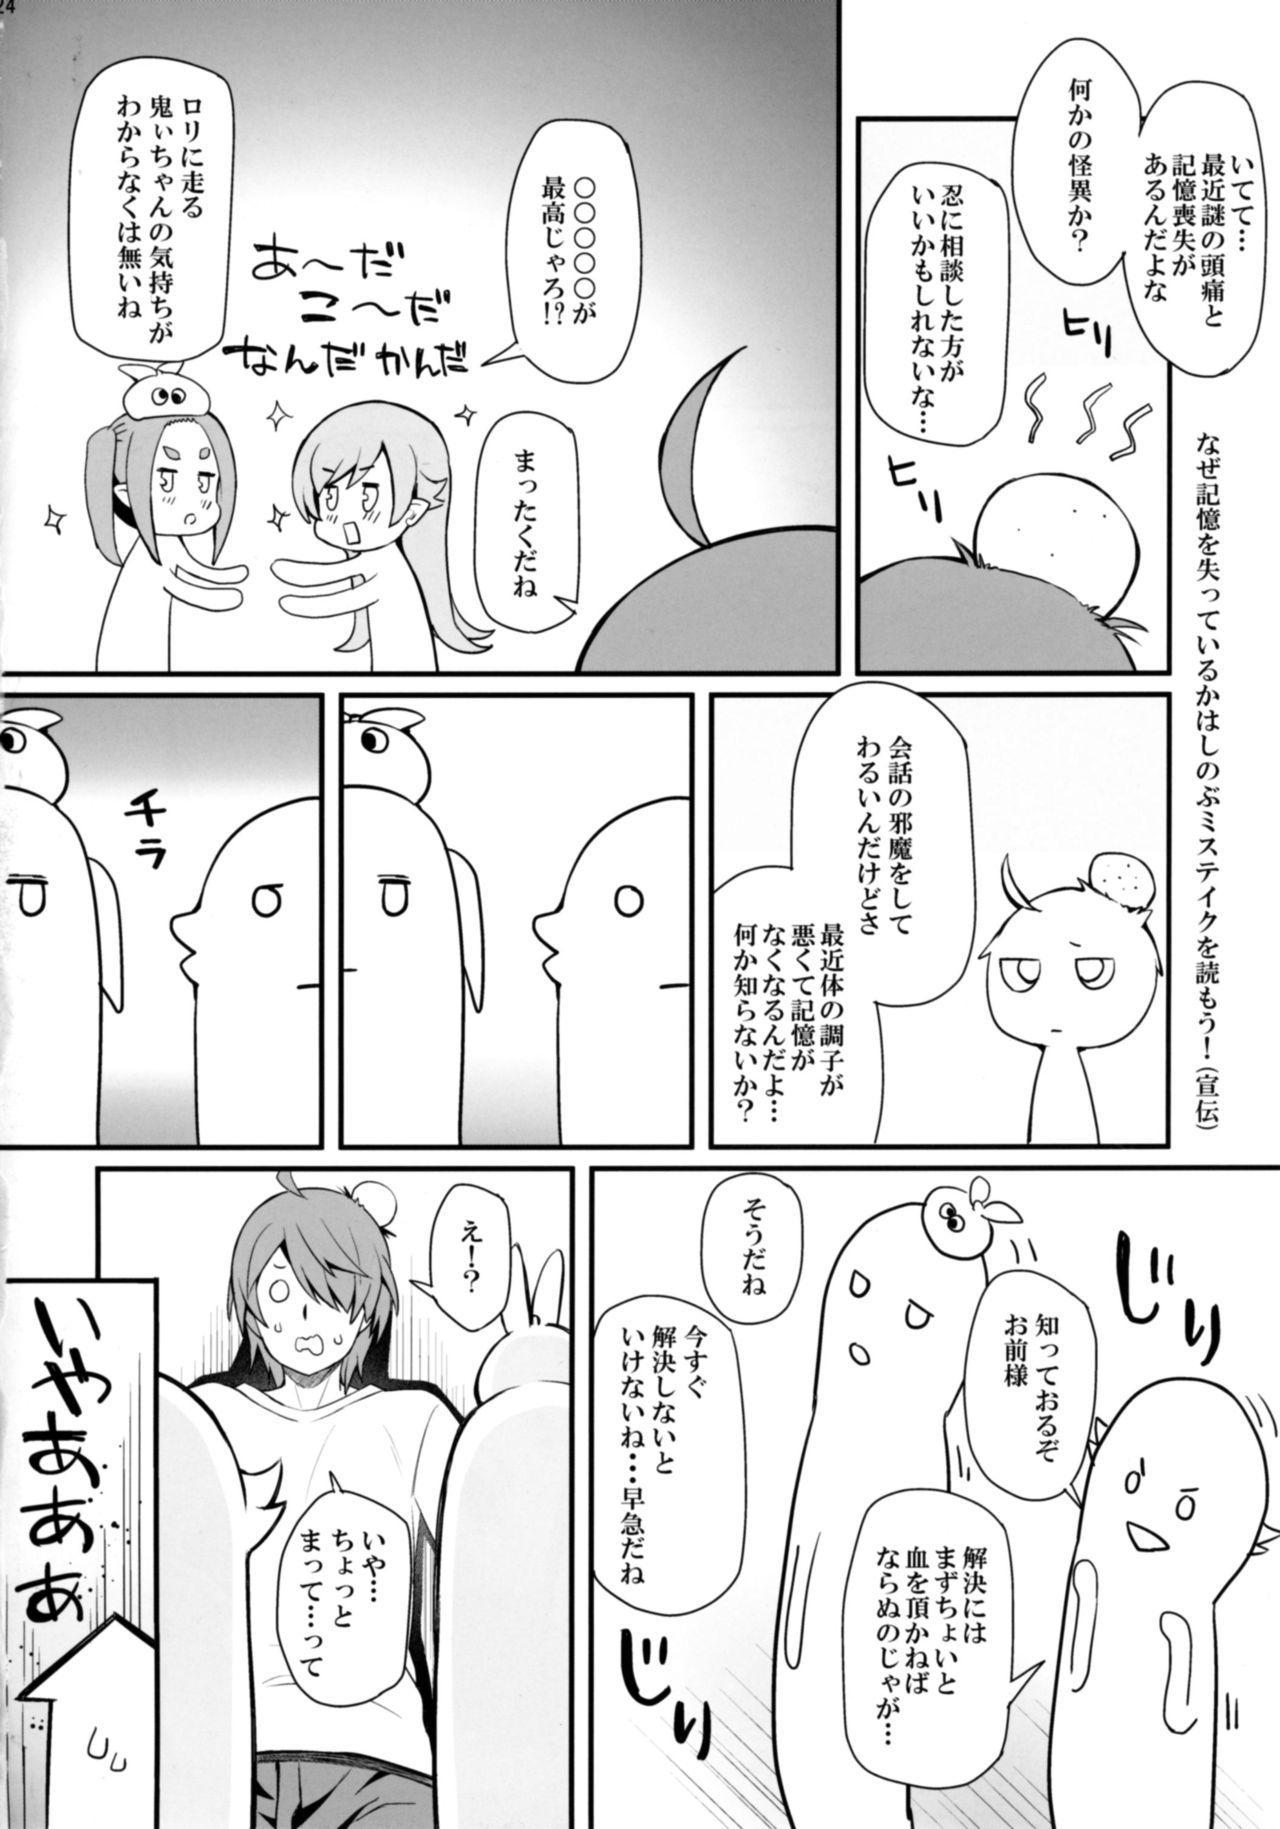 Pachimonogatari Part 14: Yotsugi Success 23